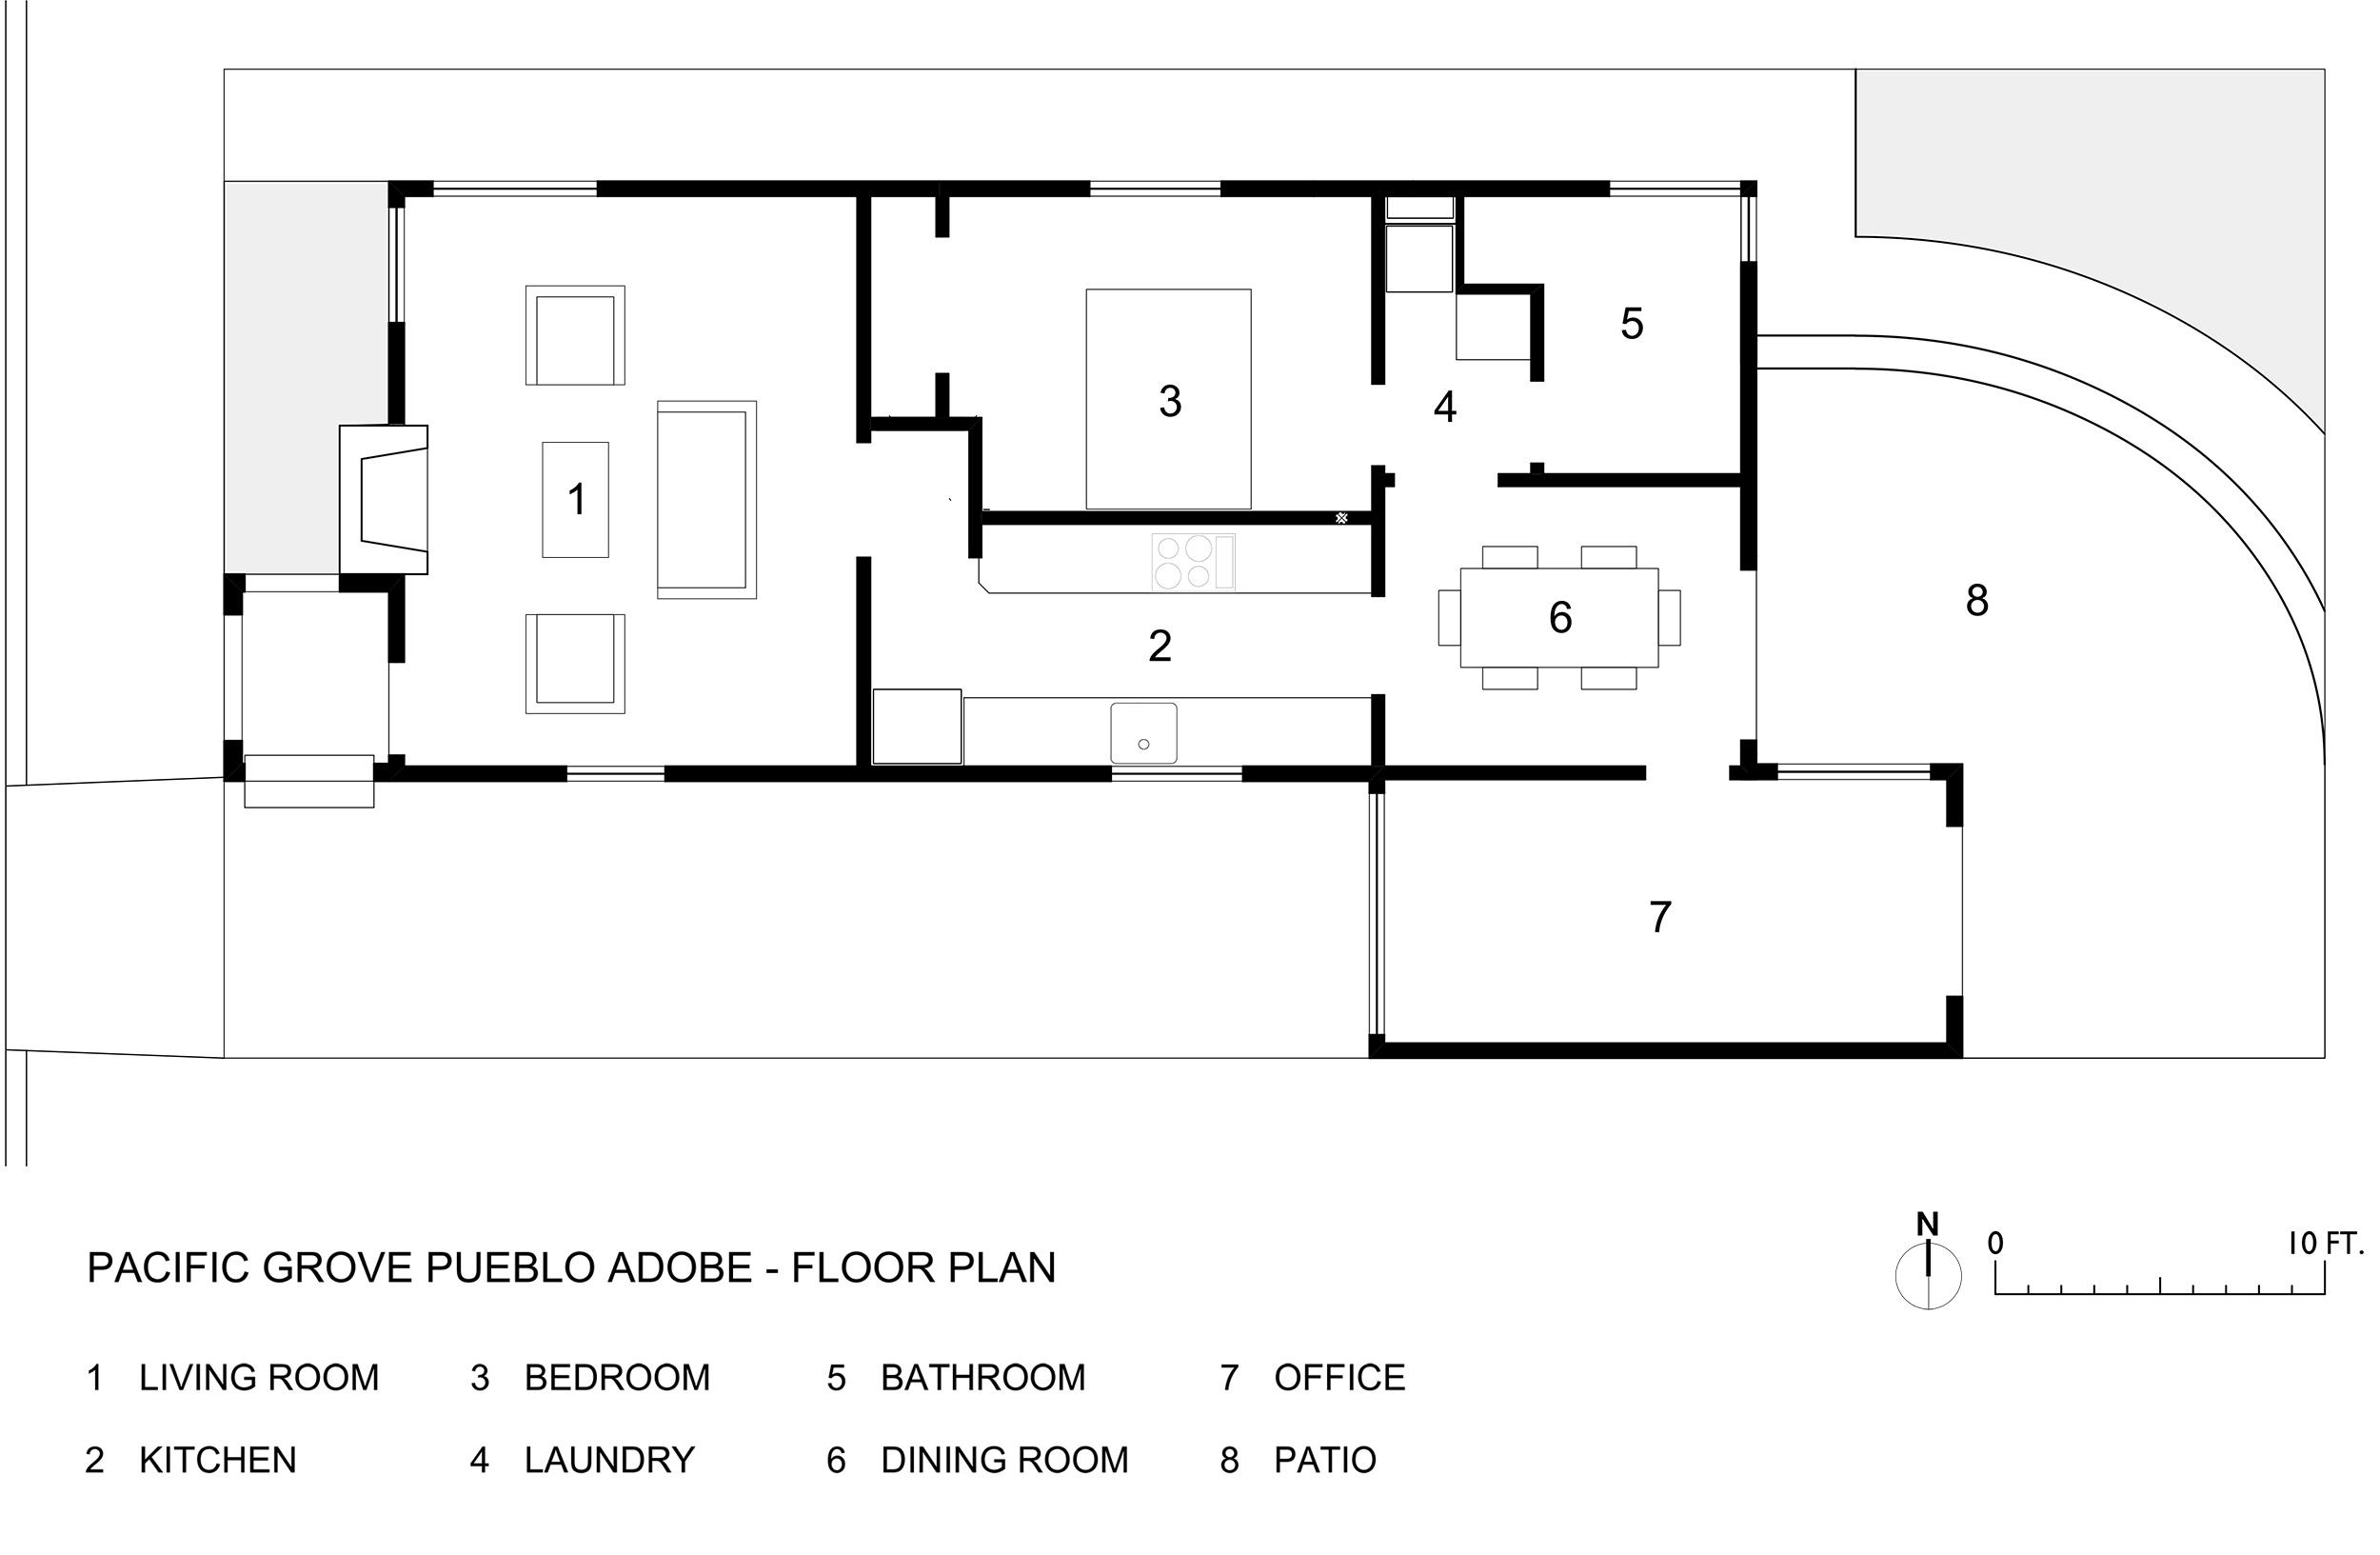 PG Pueblo Adobe Newberger-floor-plan-website.jpg